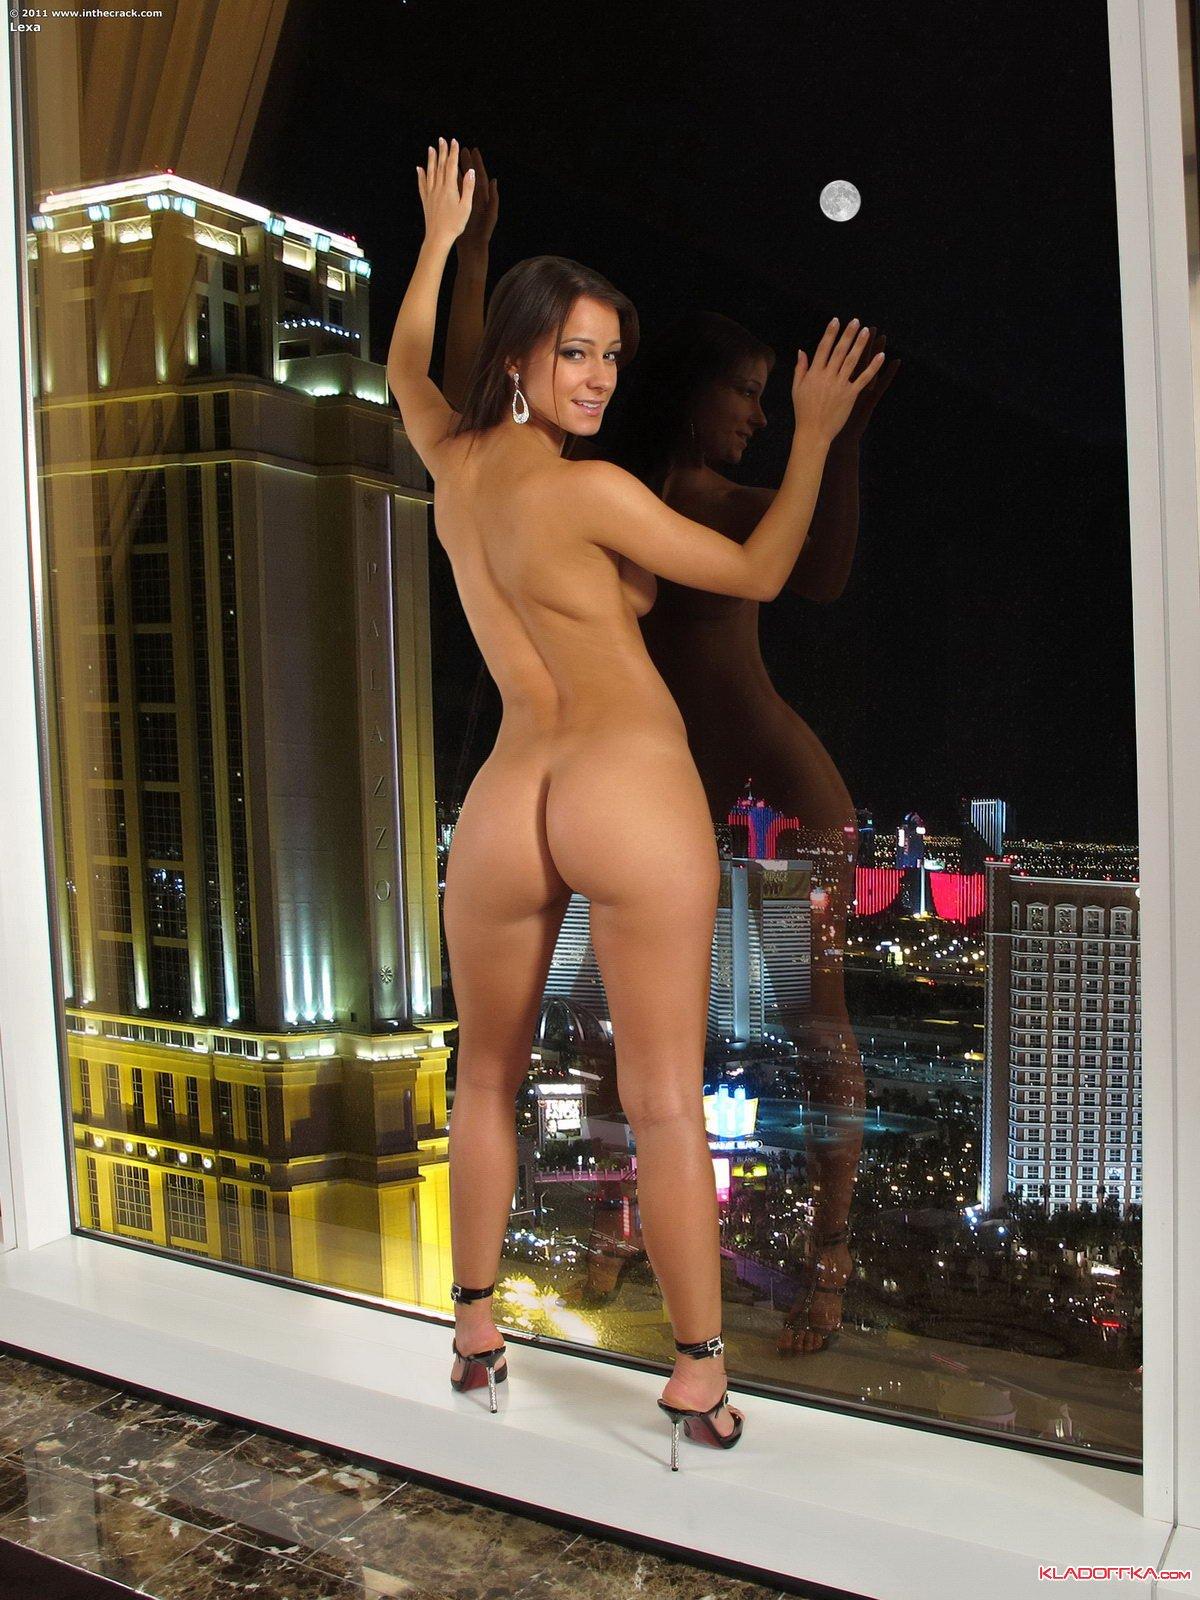 Prostitutas En Las Vegas